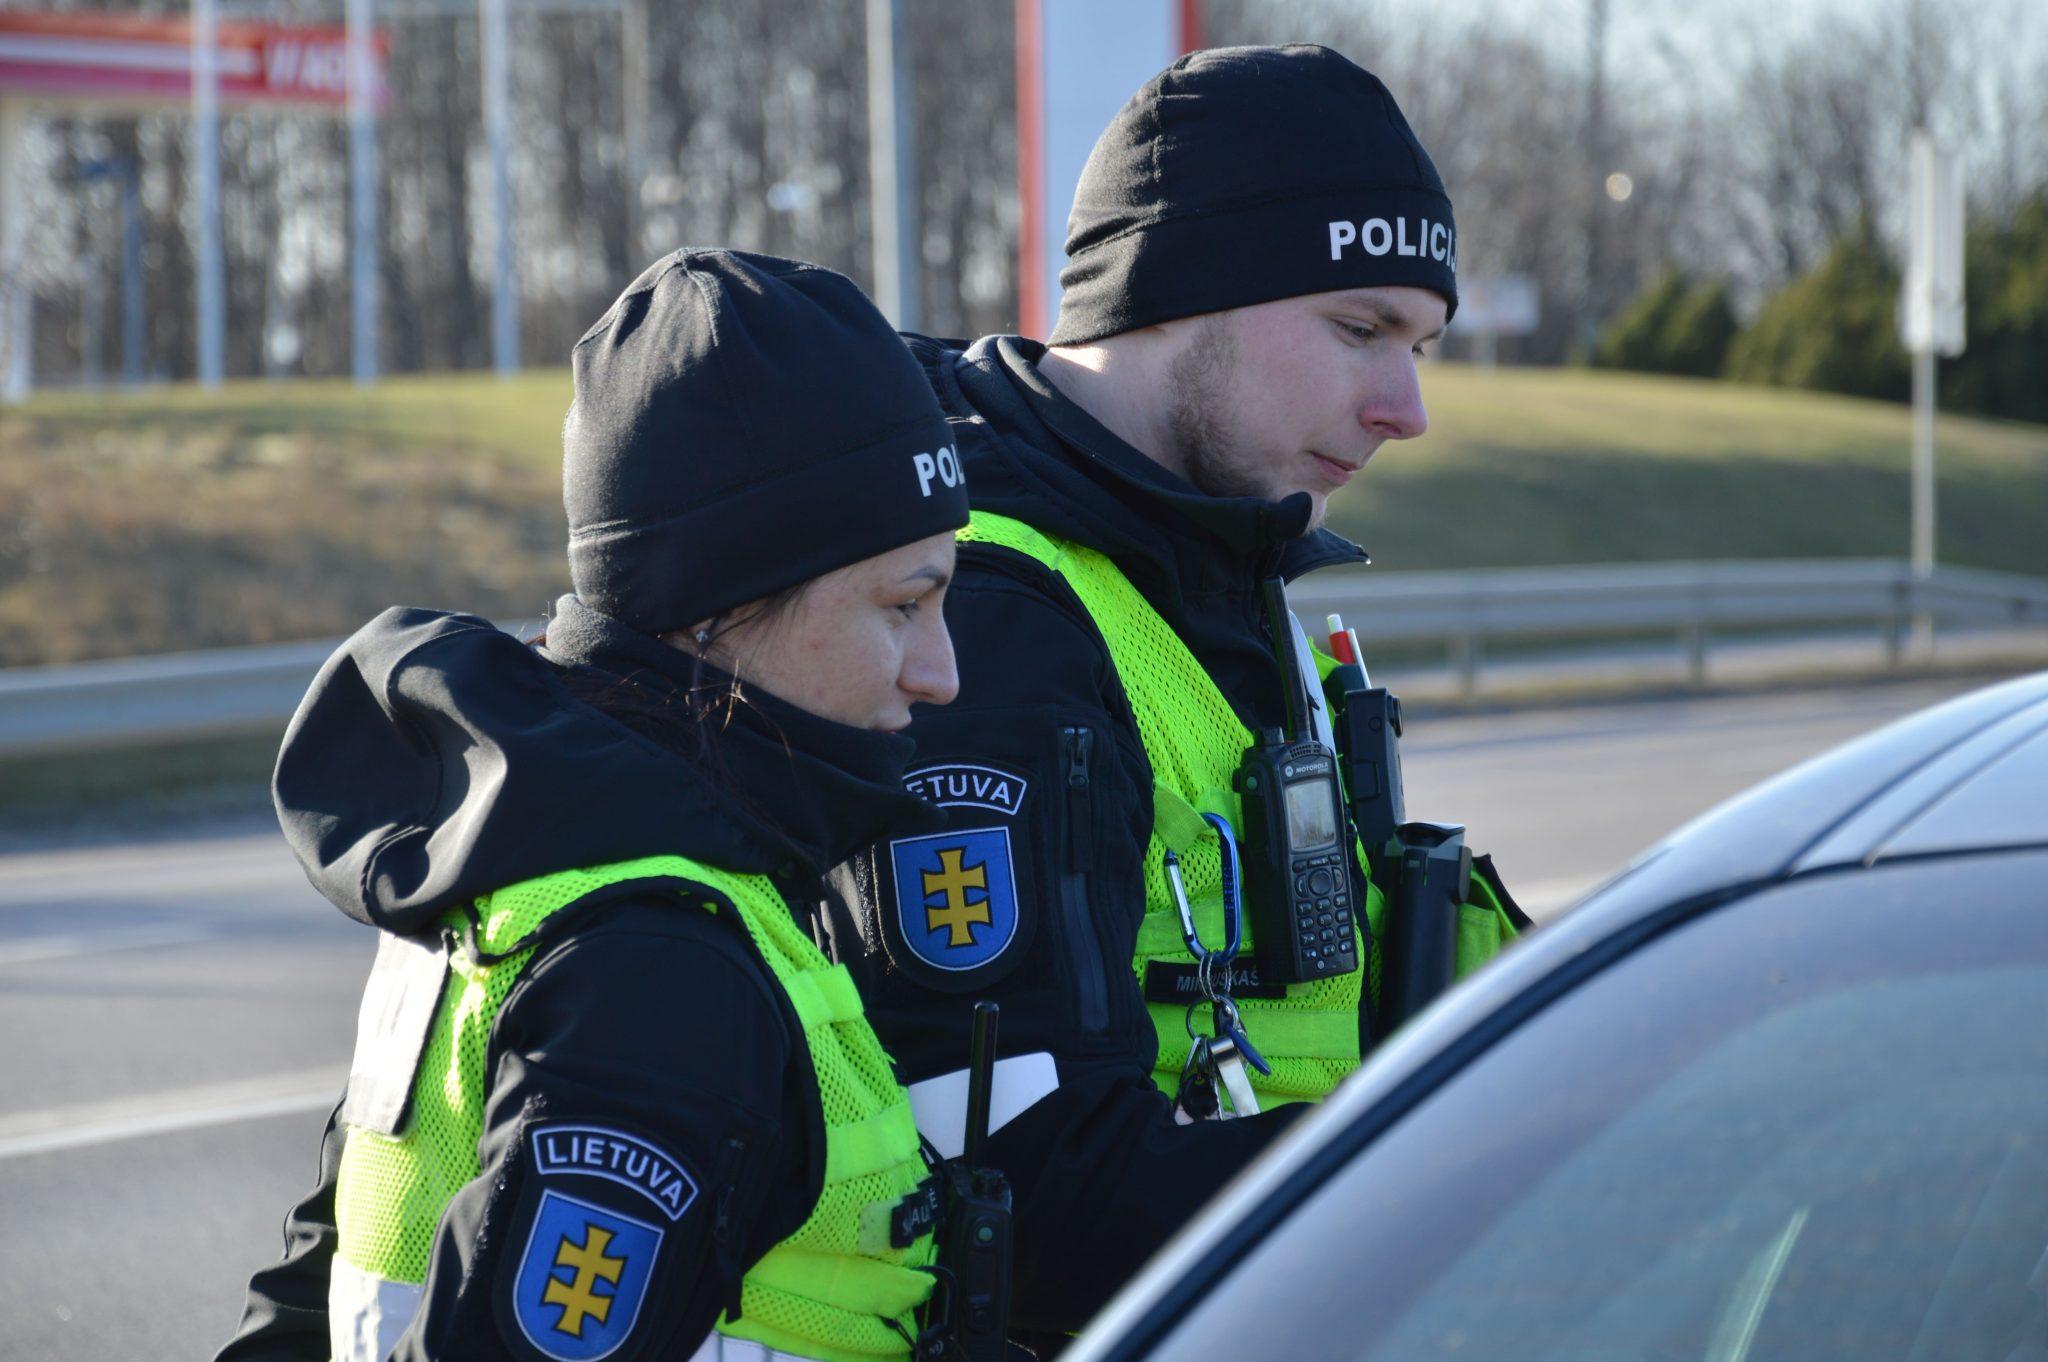 hipertenzija tarnauti policijoje